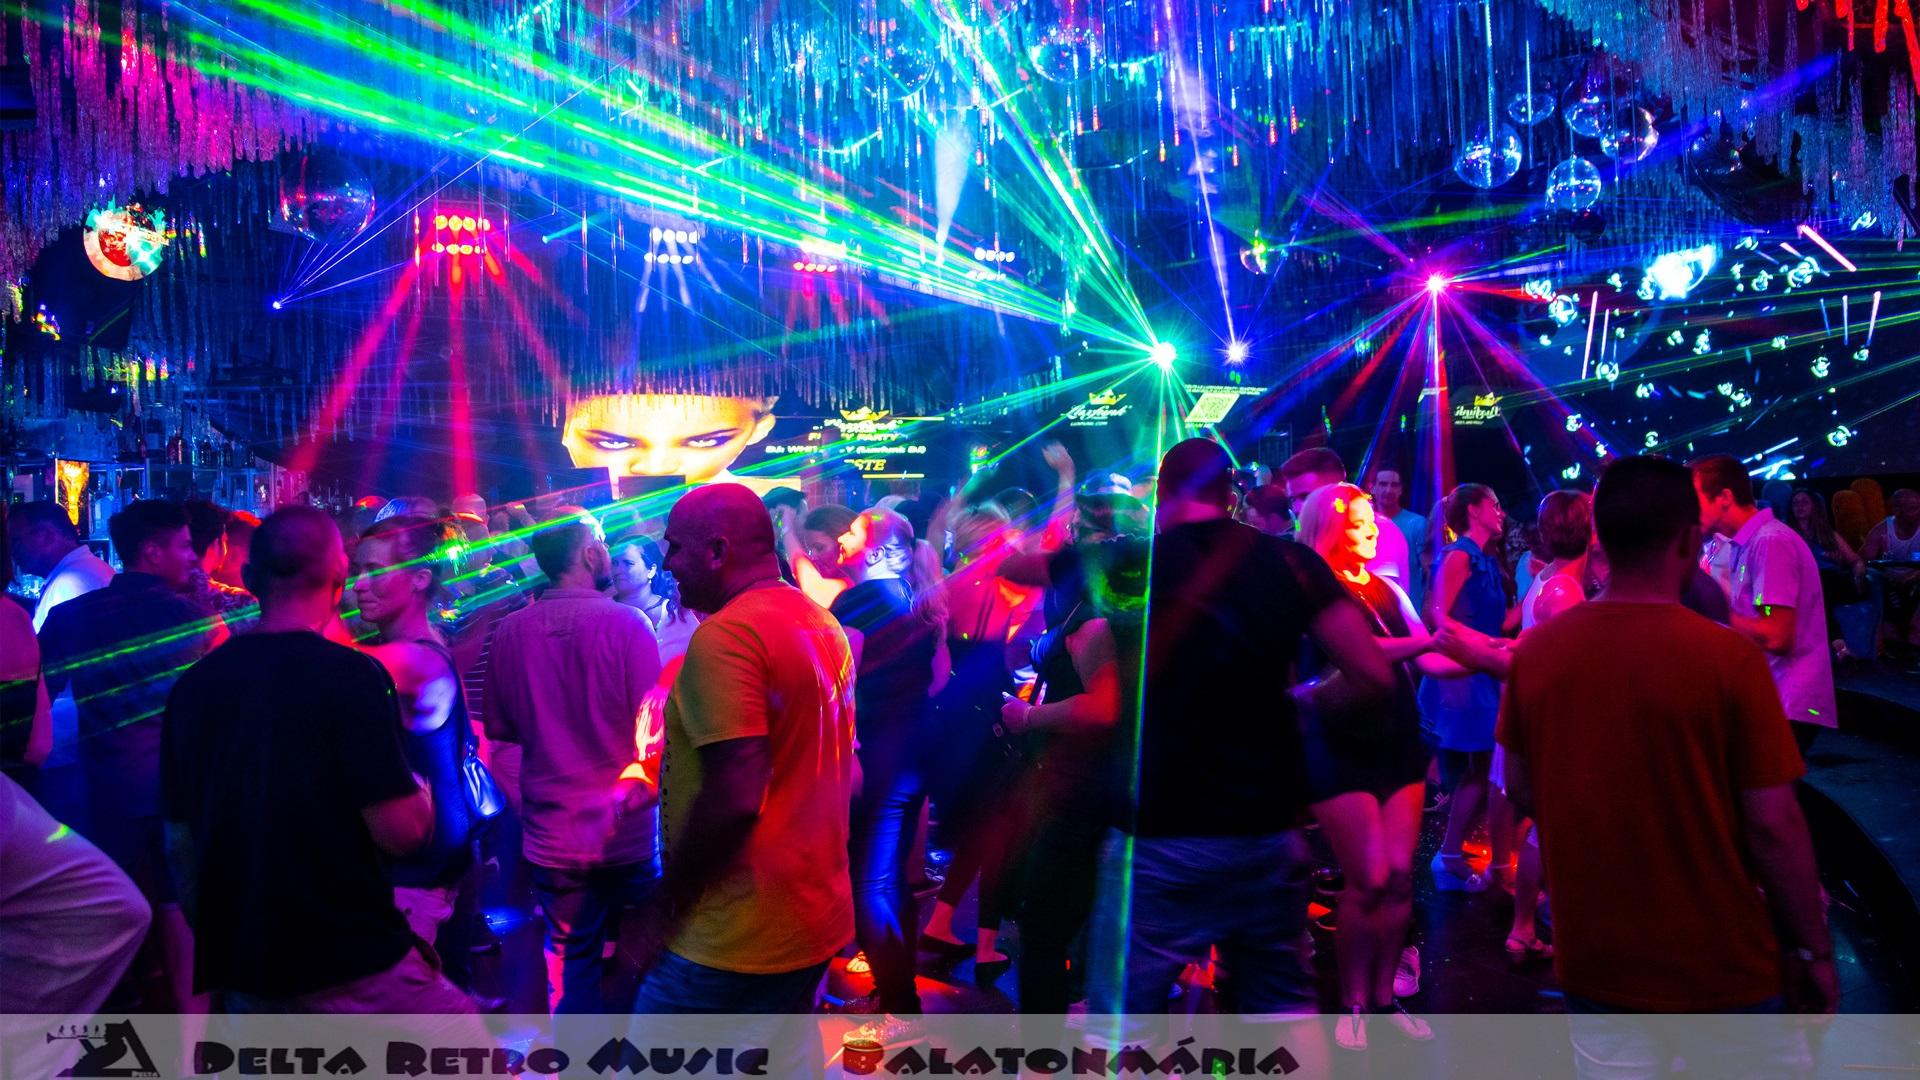 luxfunk-radio-funky-party_200807_delta retro-music-factory_056